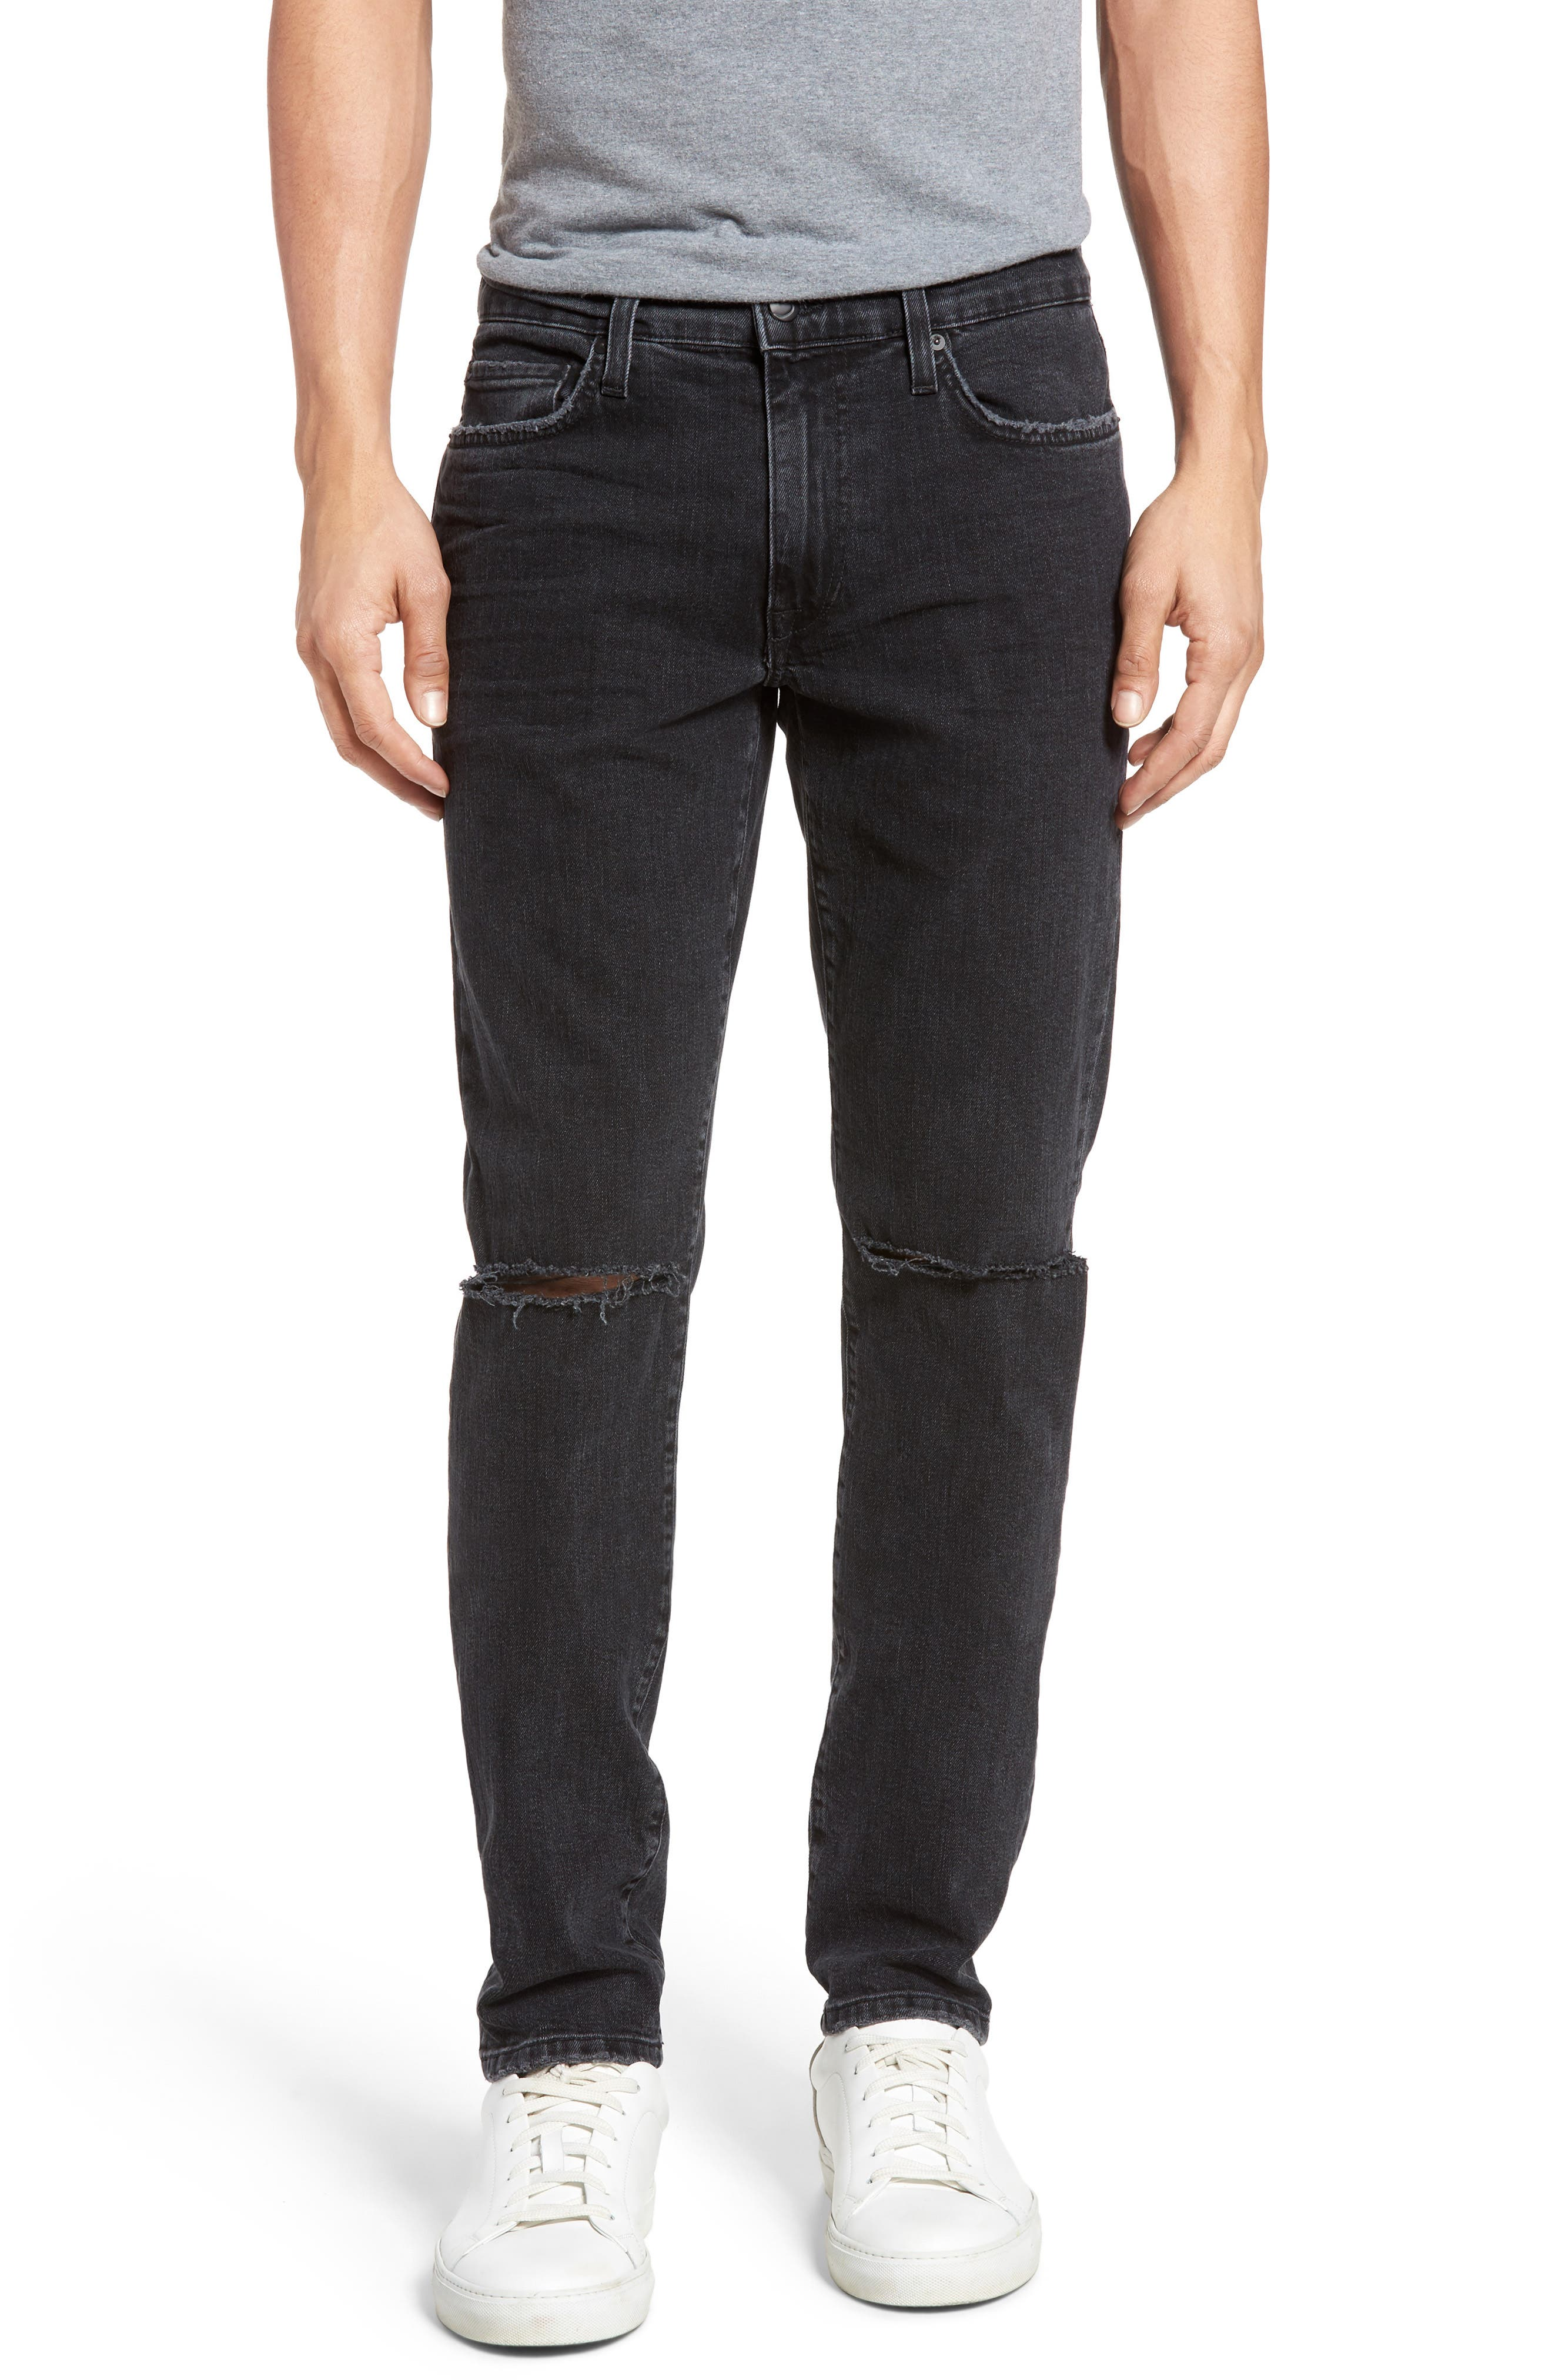 Brixton Slim Straight Fit Jeans,                             Main thumbnail 1, color,                             438